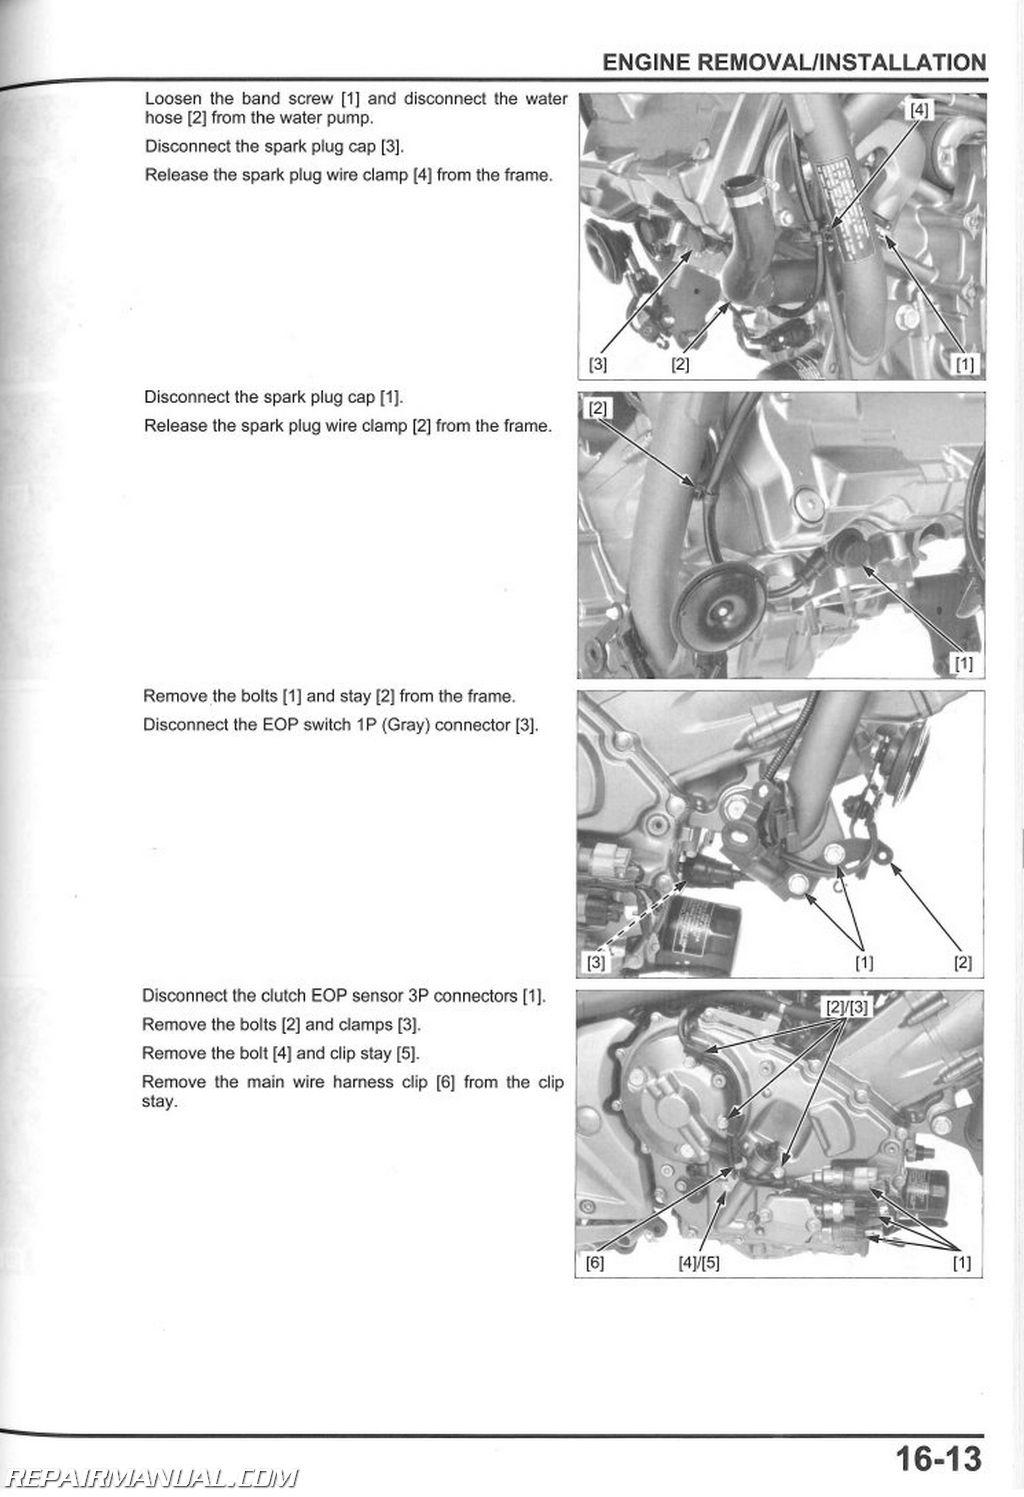 honda nc700x wiring diagramhonda nc700x wiring diagram